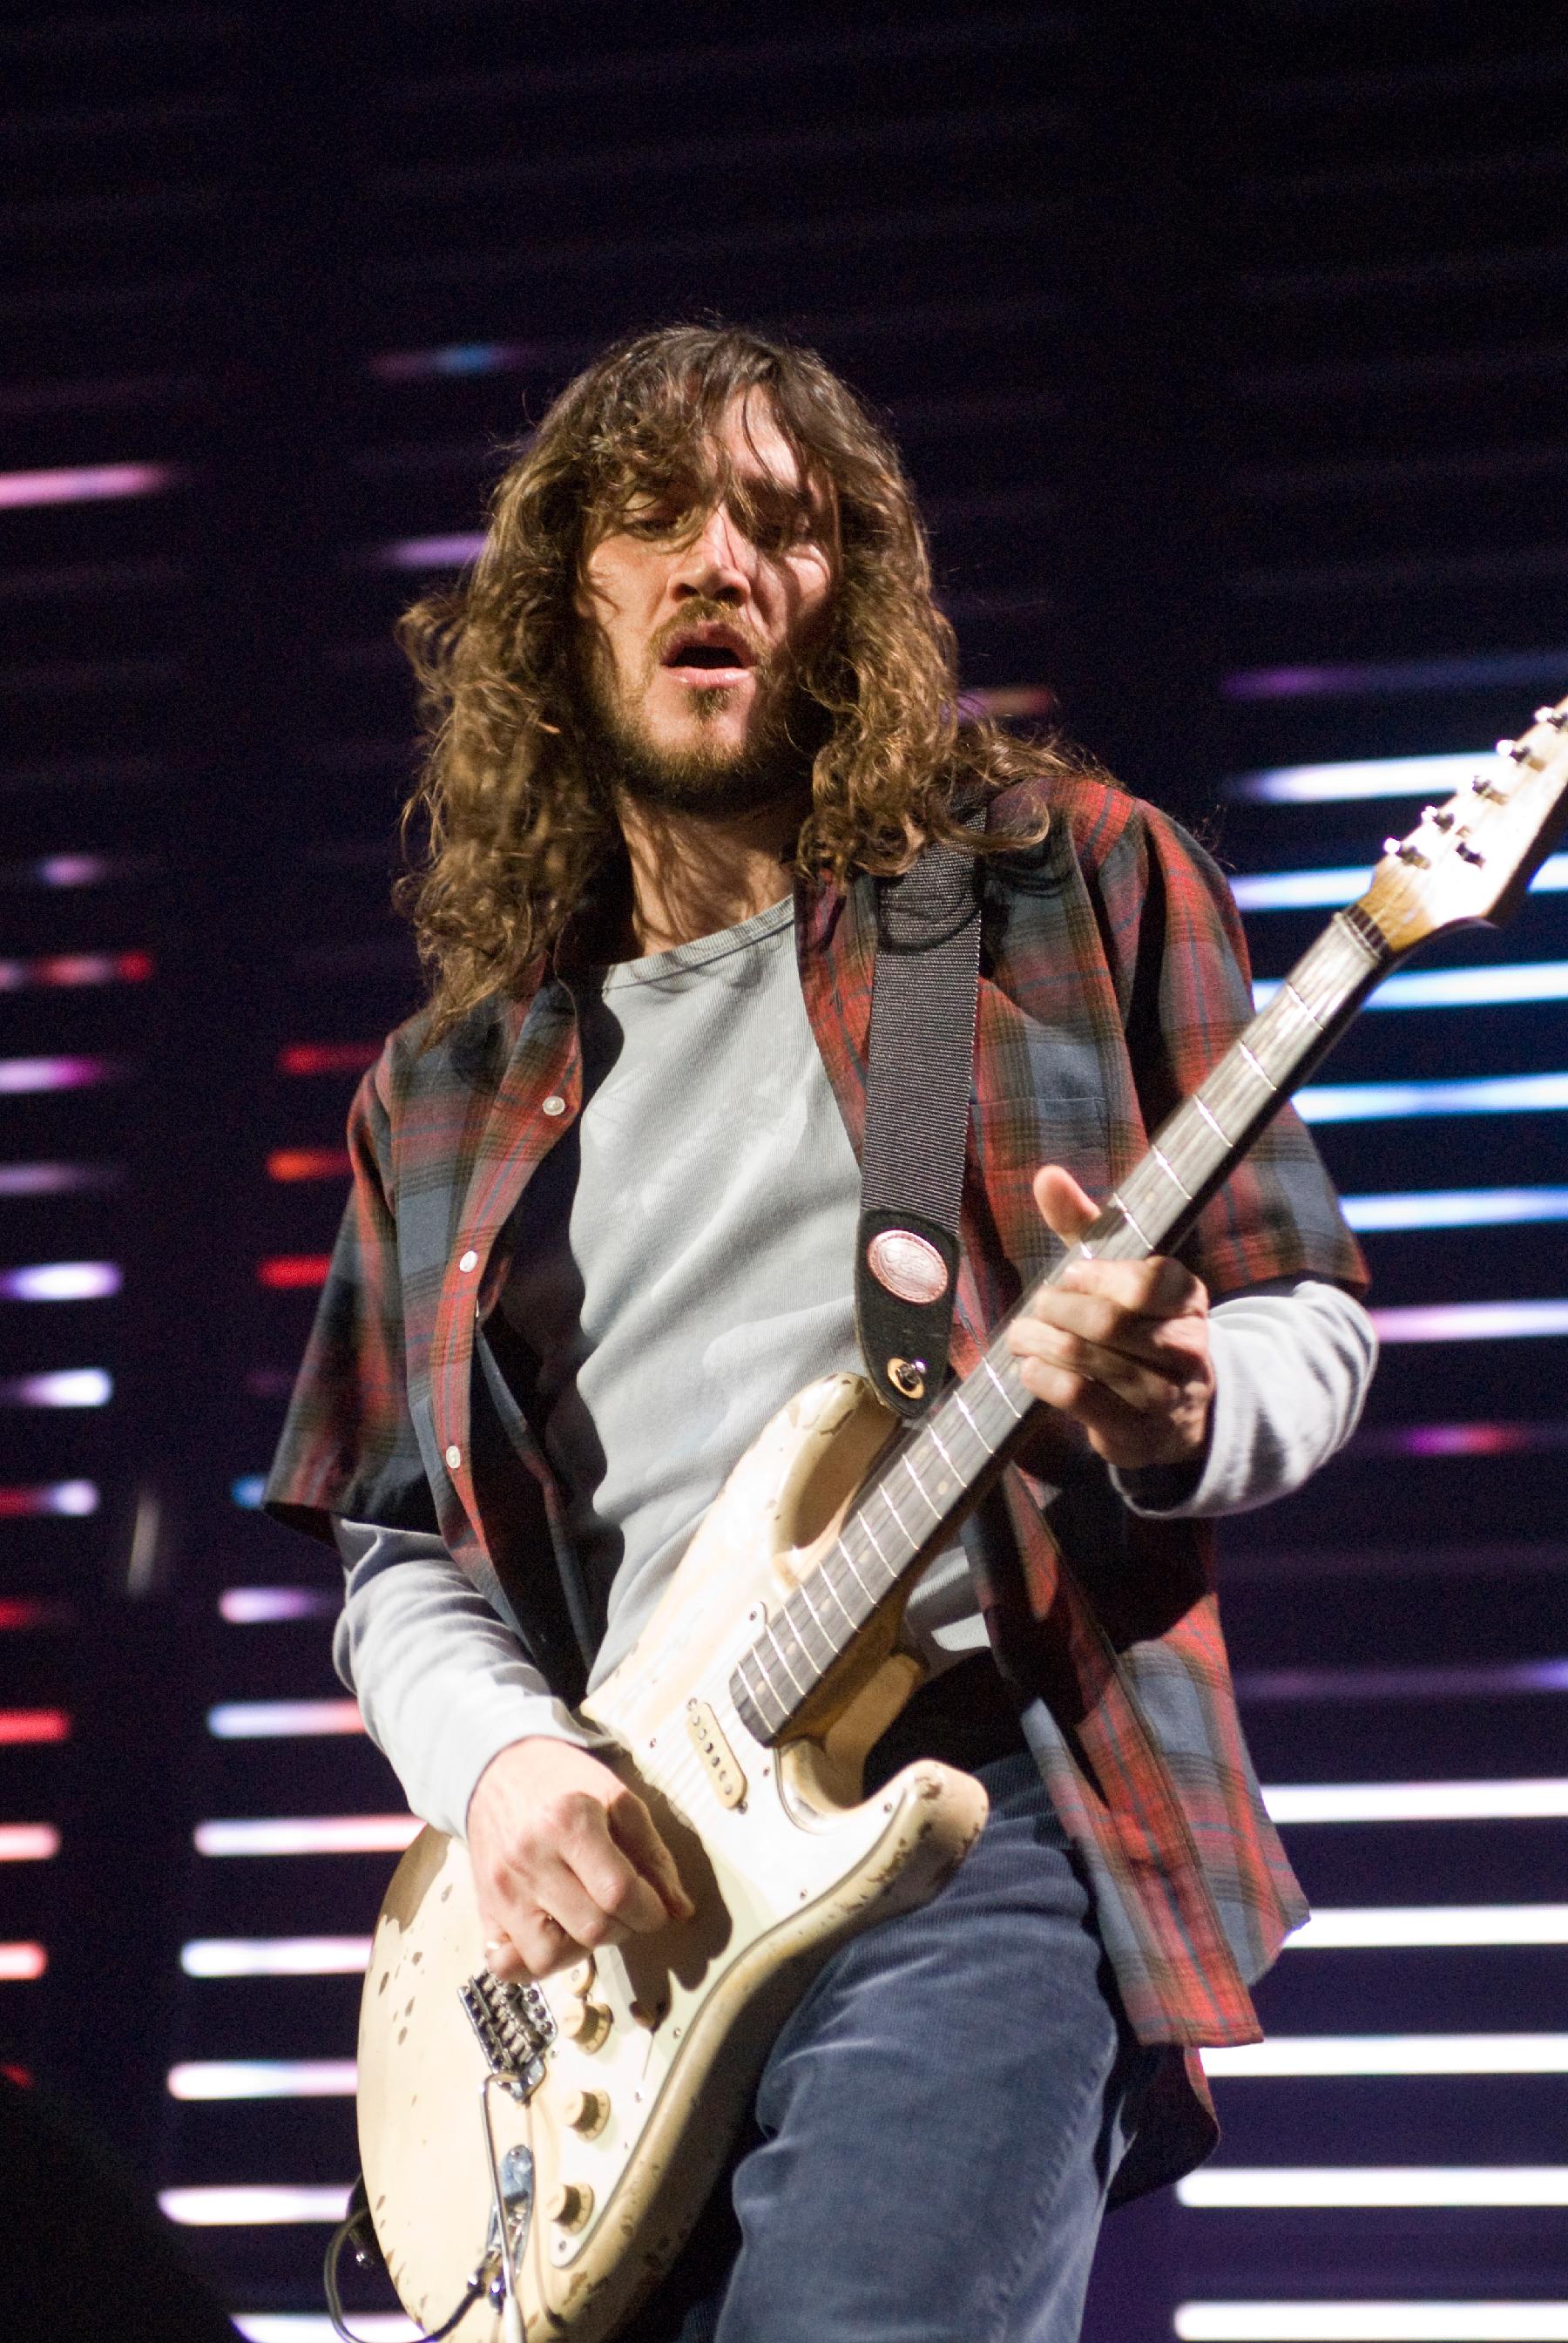 Album Launch: John Frusciante Sends New LP Into Space on Rocket